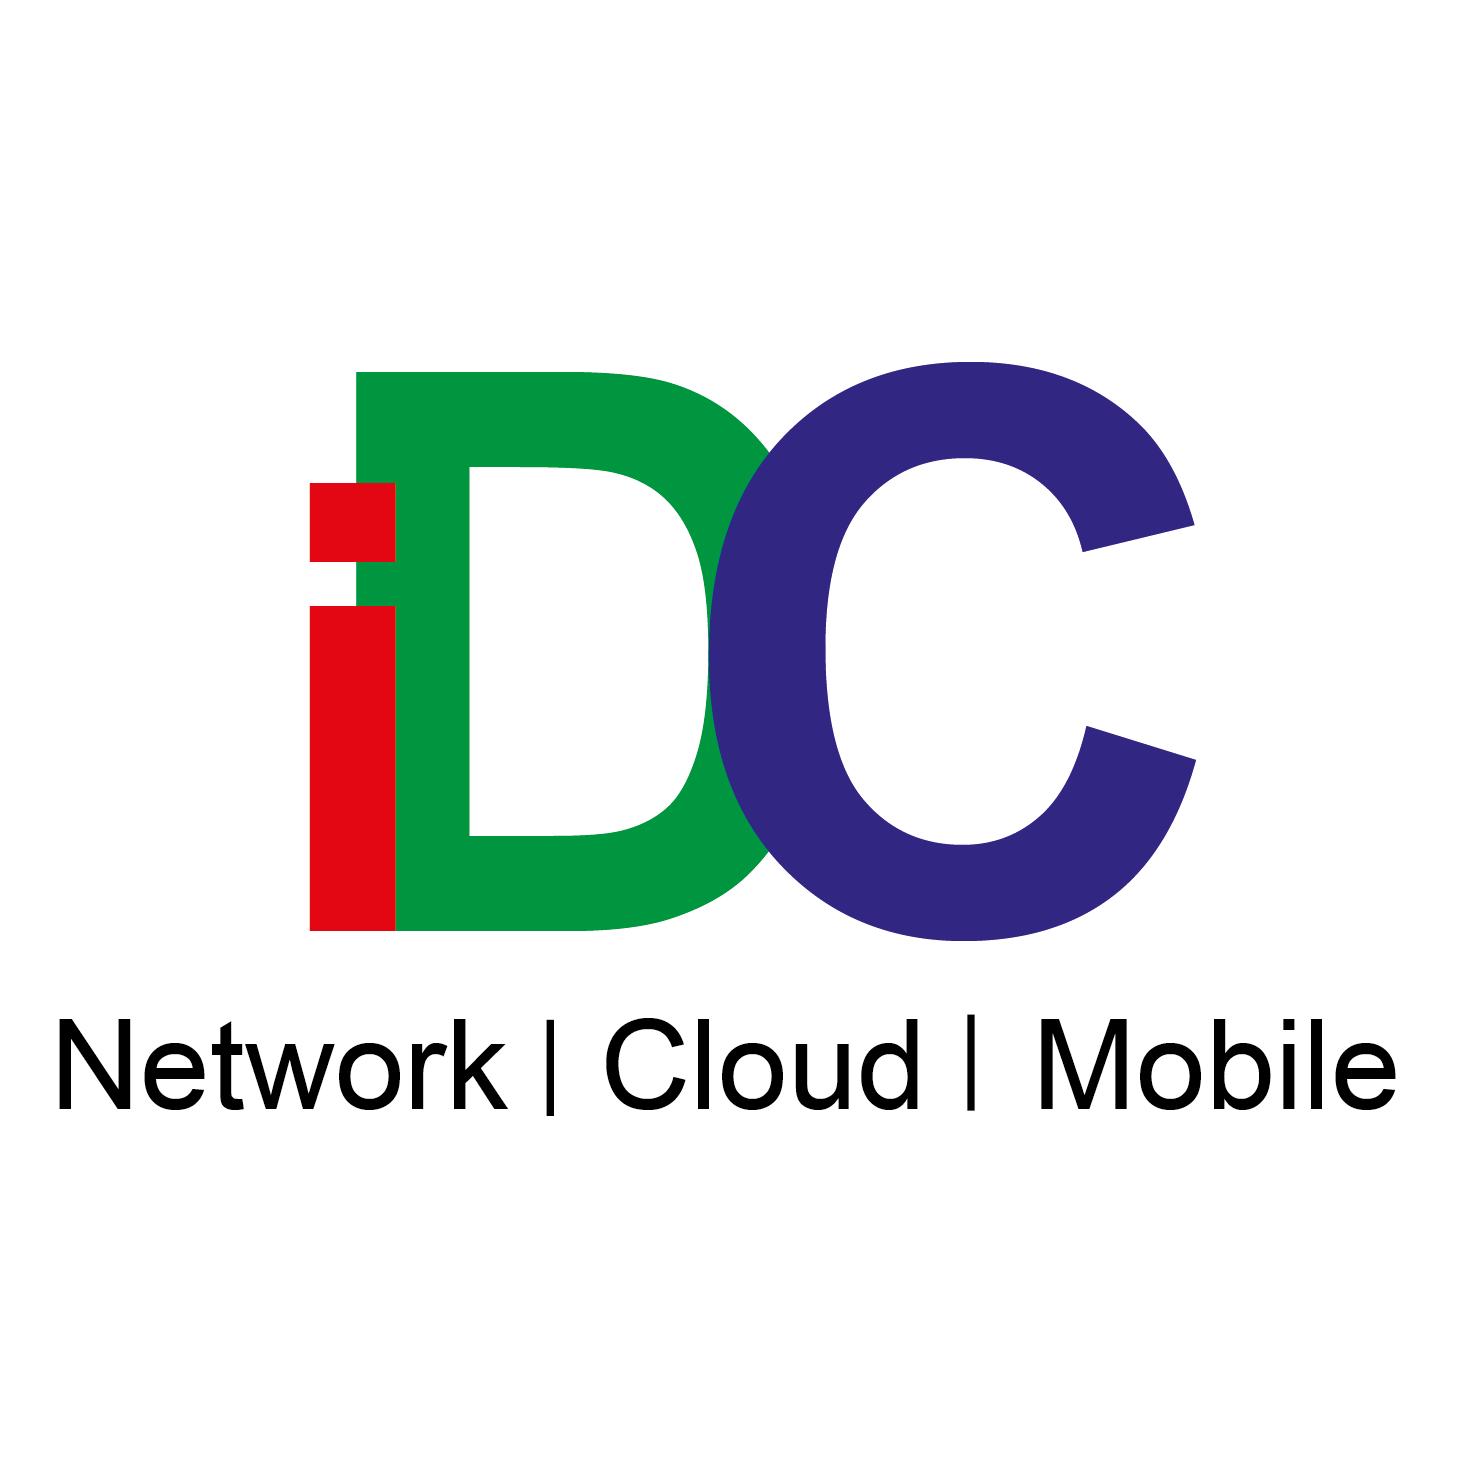 iDC Business Communications